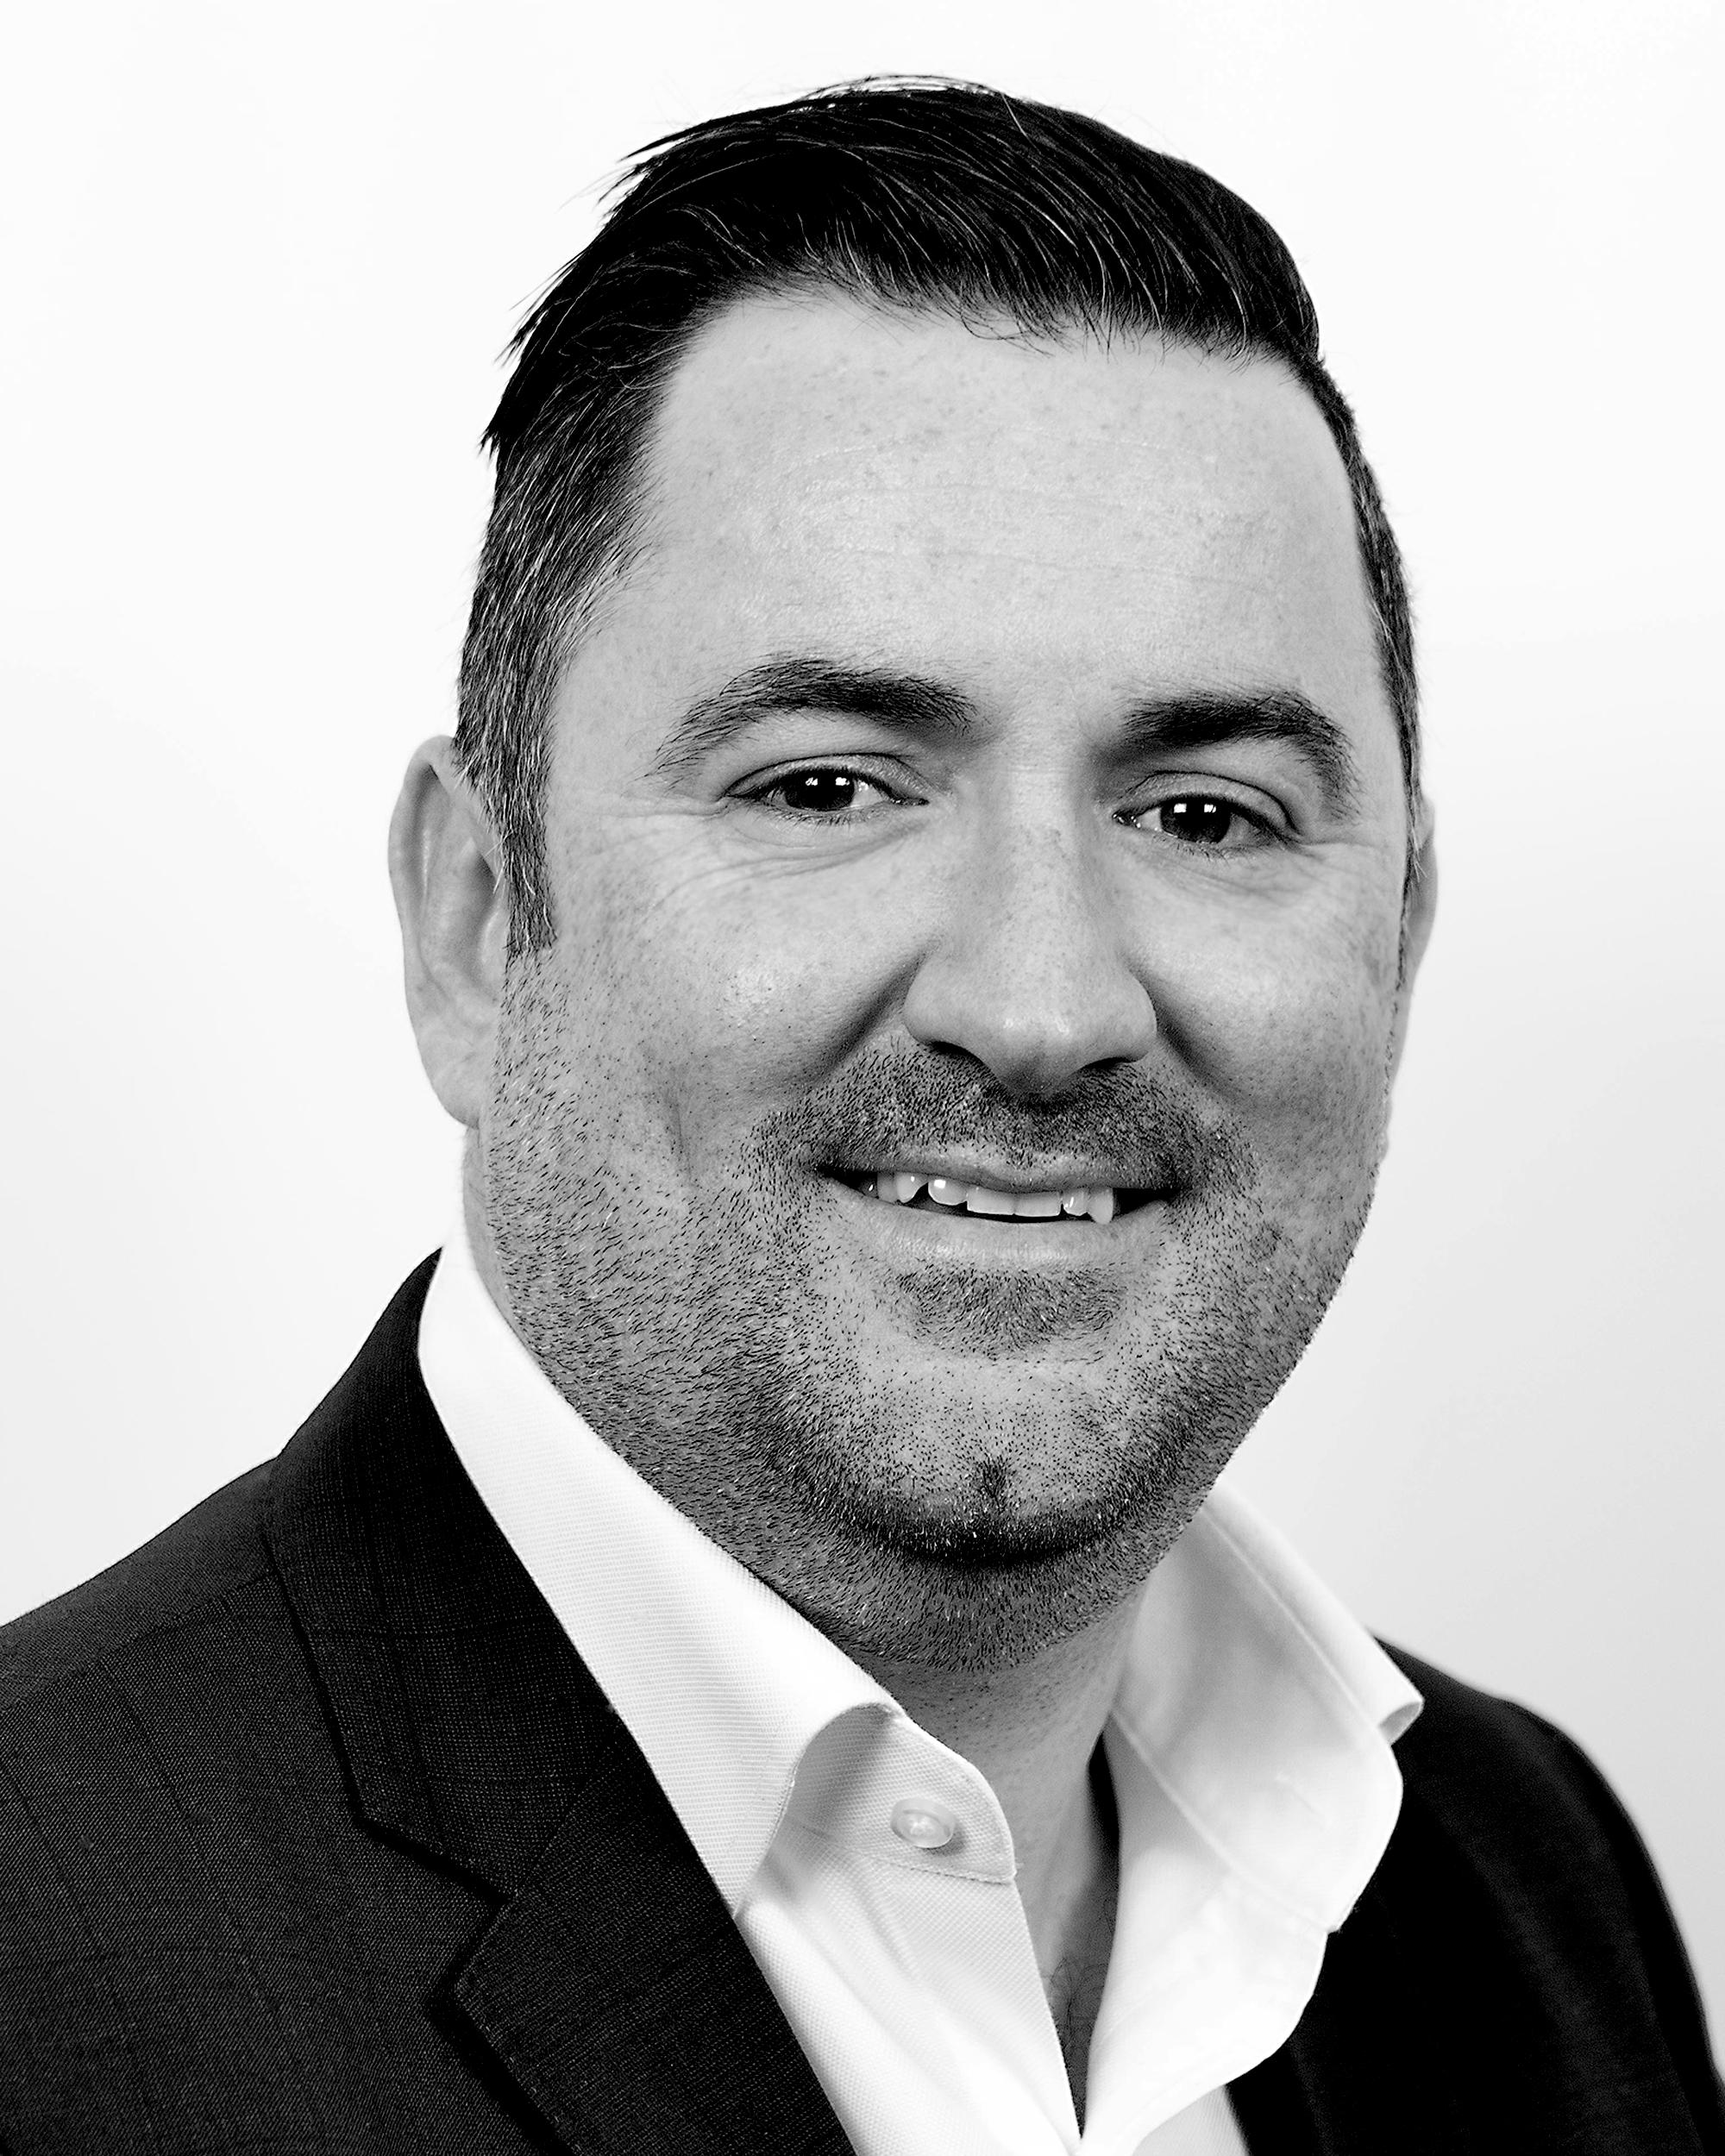 Headshot of David O'Gorman